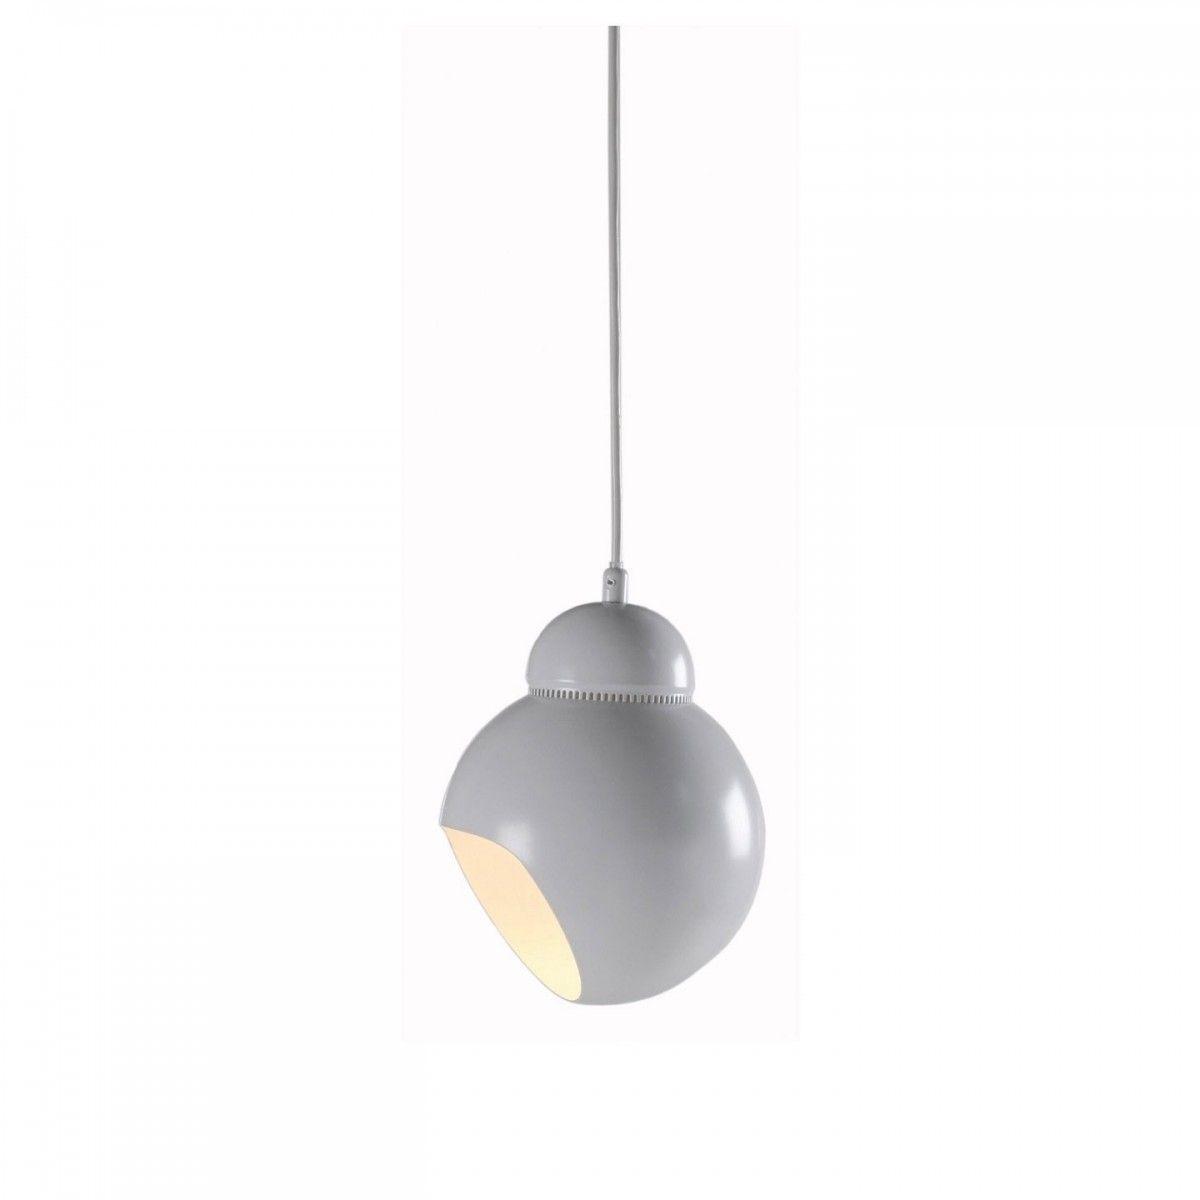 Artek products lighting pendant light a338 - A338 Bilberry Pendant Lamp By Alvar Aalto For Artek